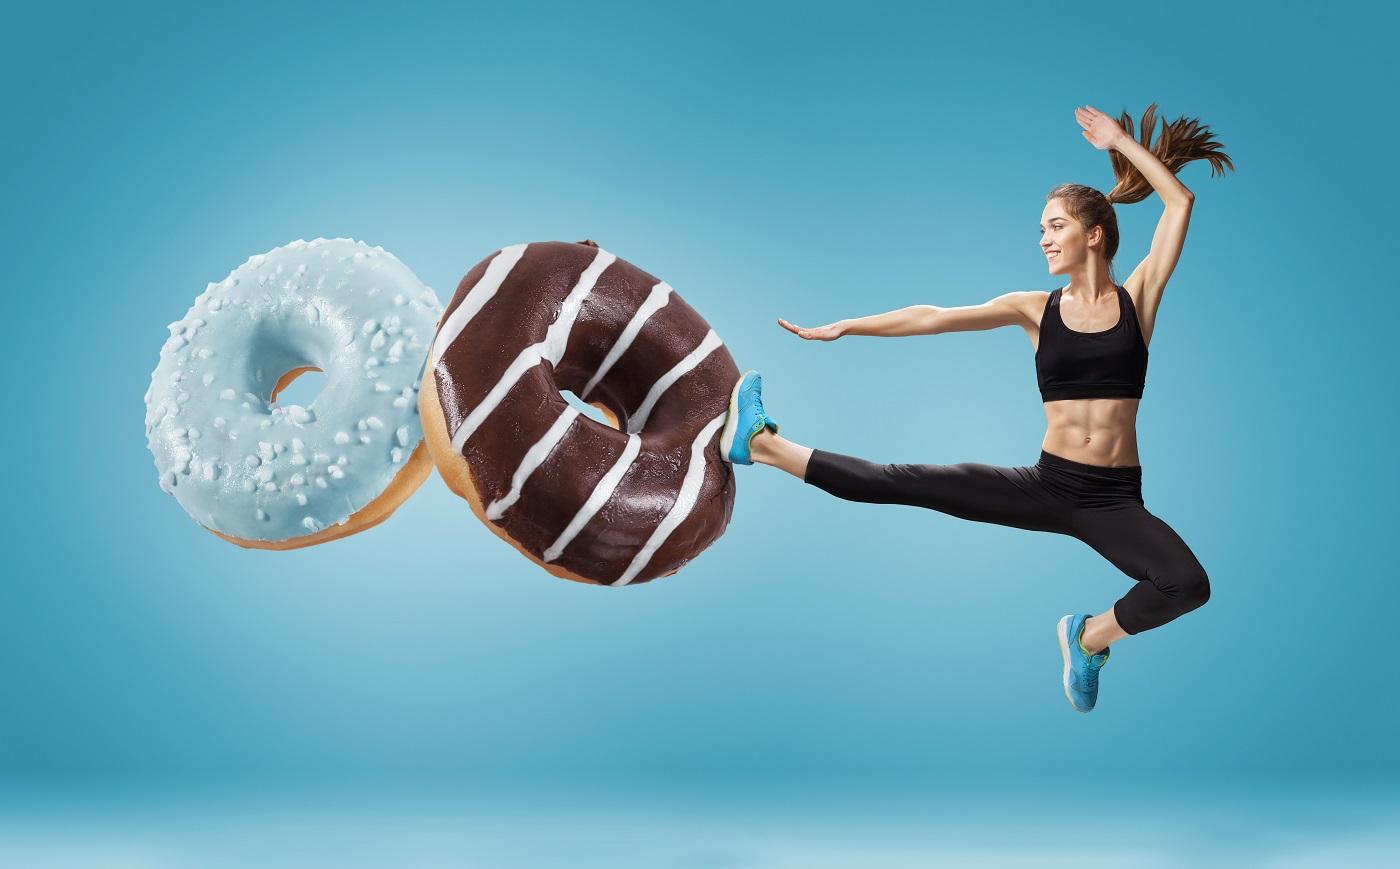 Zuckerentzug-Sugar-Detox-Kur